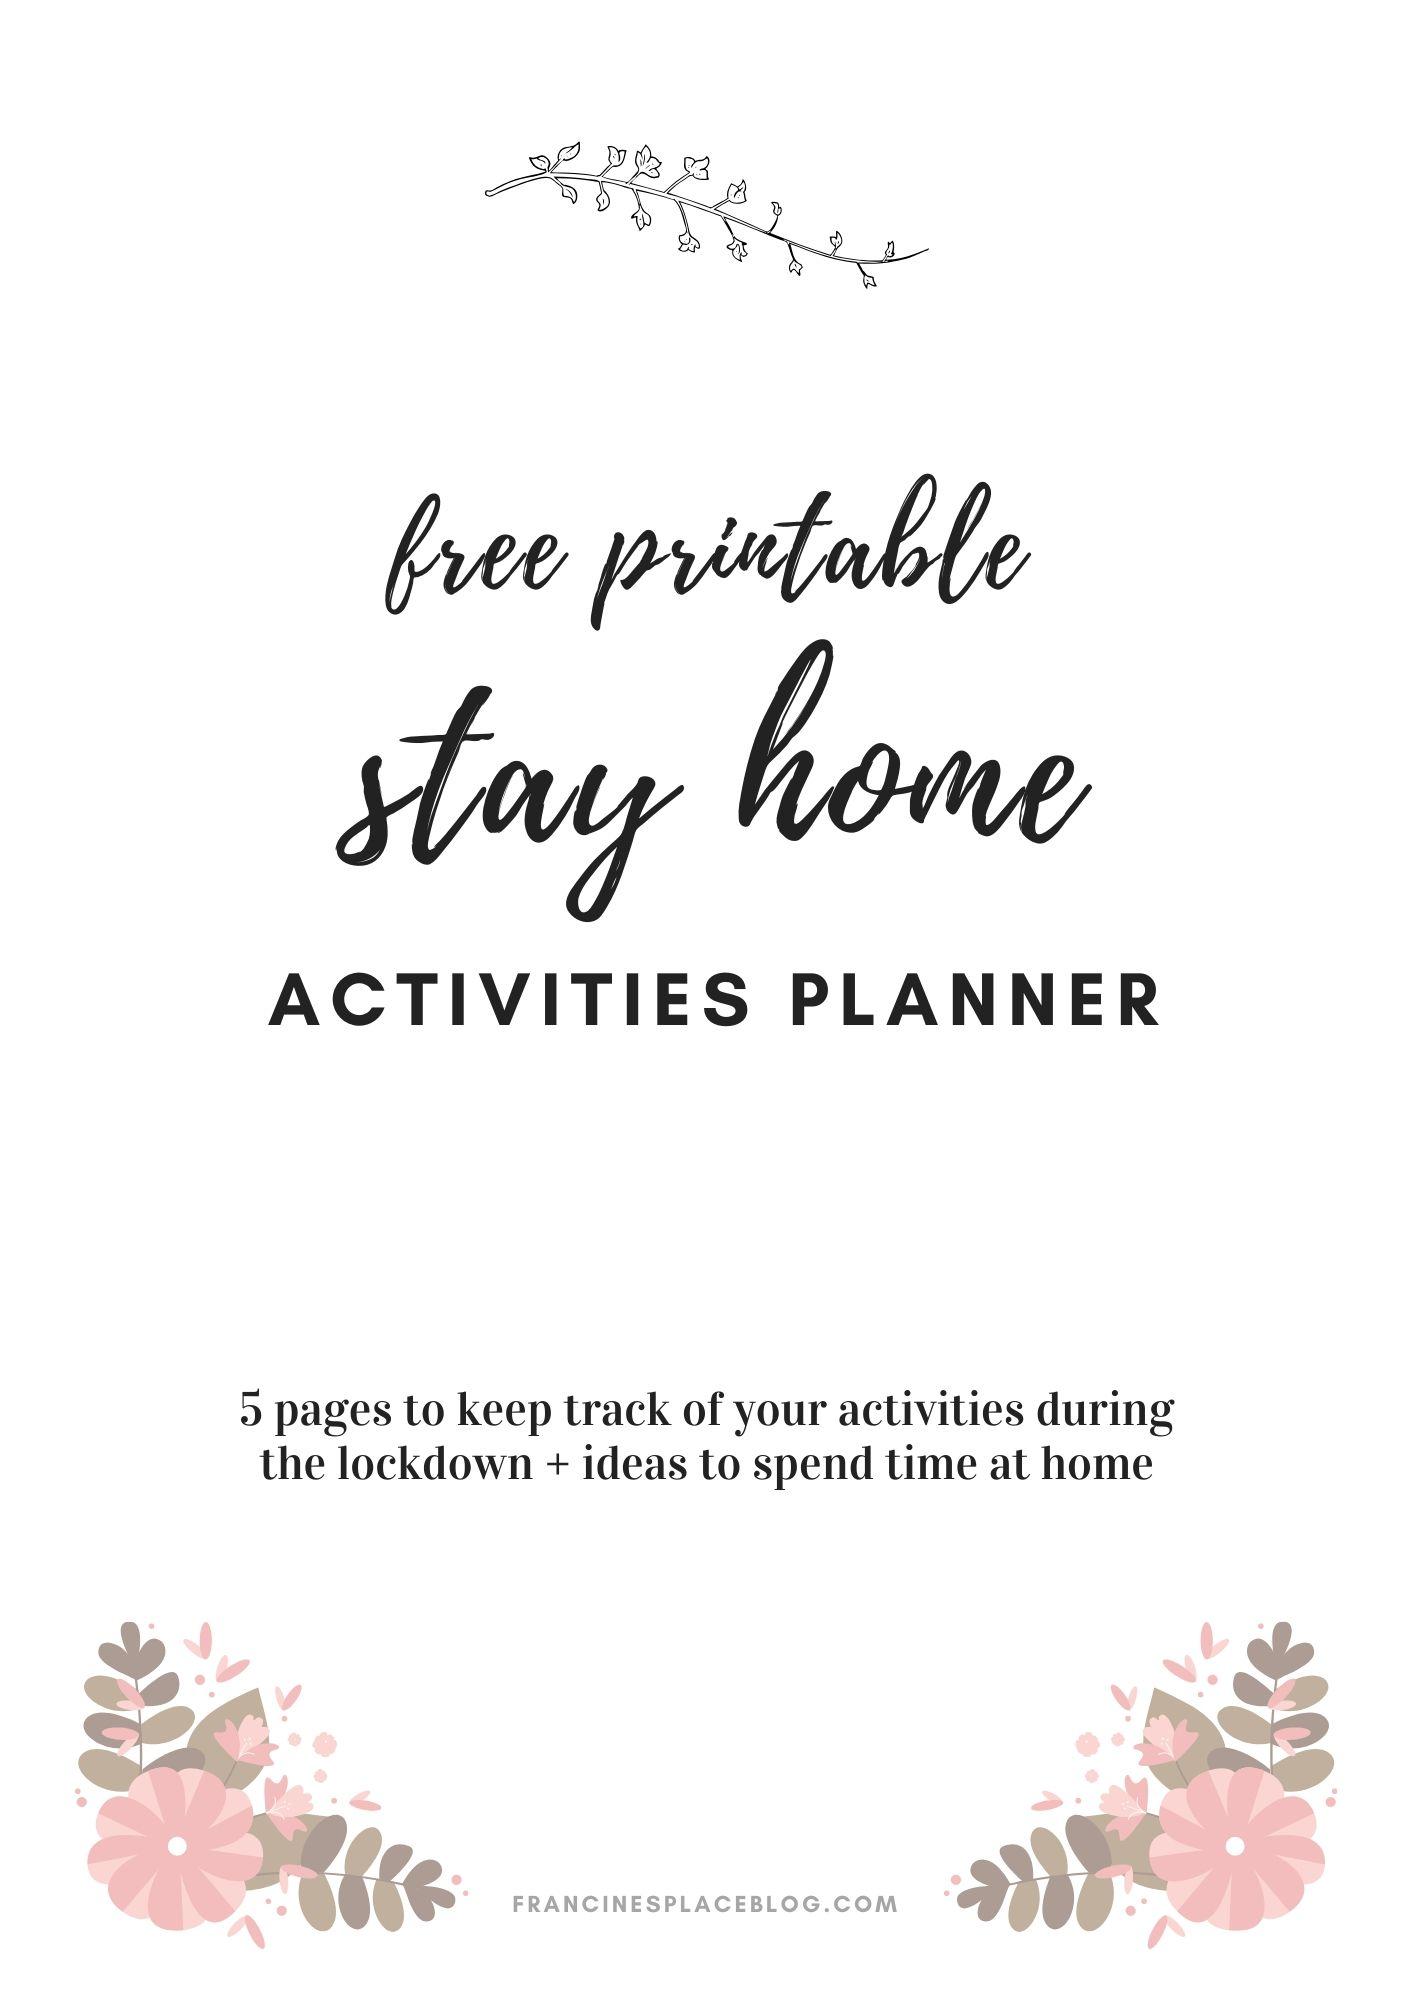 free printable stay home activities planner lockdown quarantine covid ideas schedule time francinesplaceblog